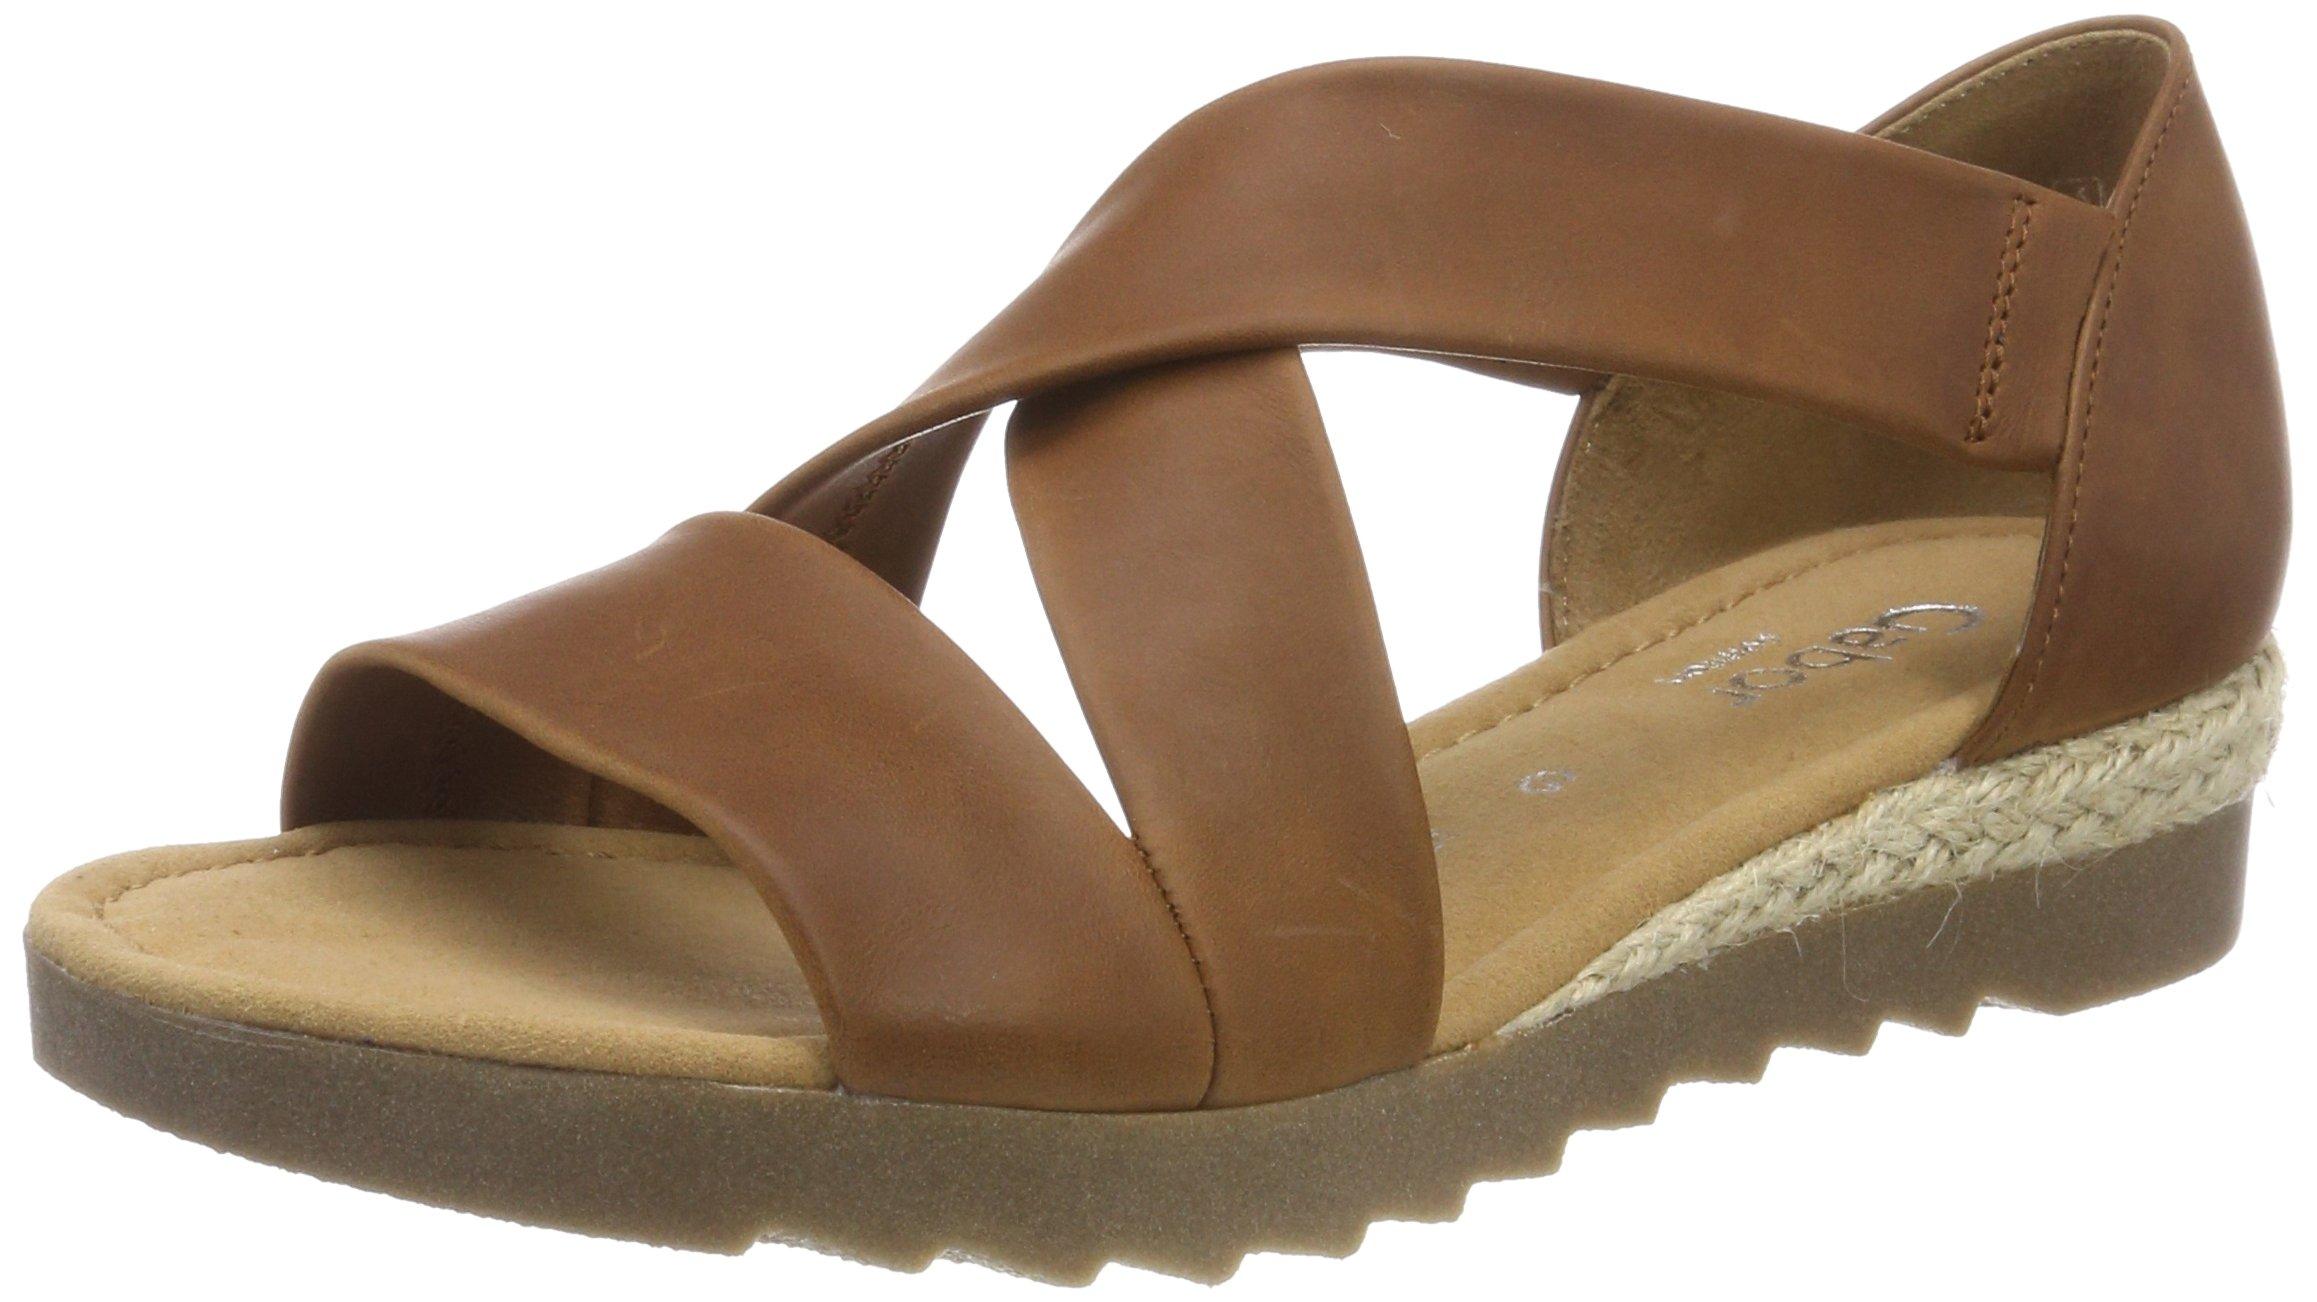 Cheville ambra37 Comfort Gabor 5 FemmeMarronpeanutjute Eu Bride SportSandales Shoes DbEH92YWeI